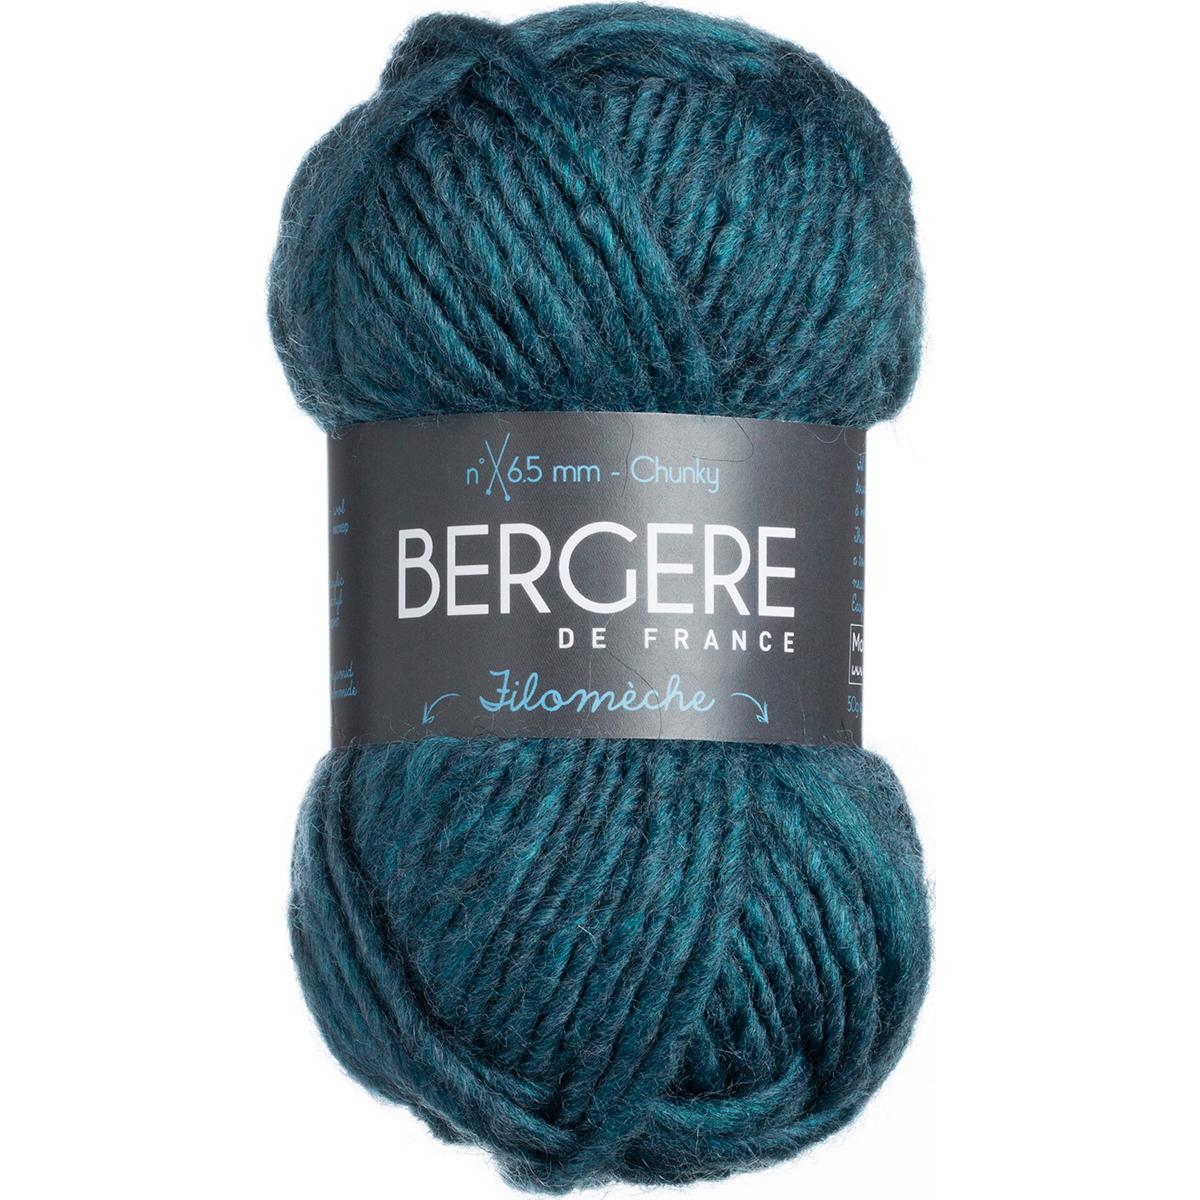 Bergere De France Filomeche Yarn-Canard